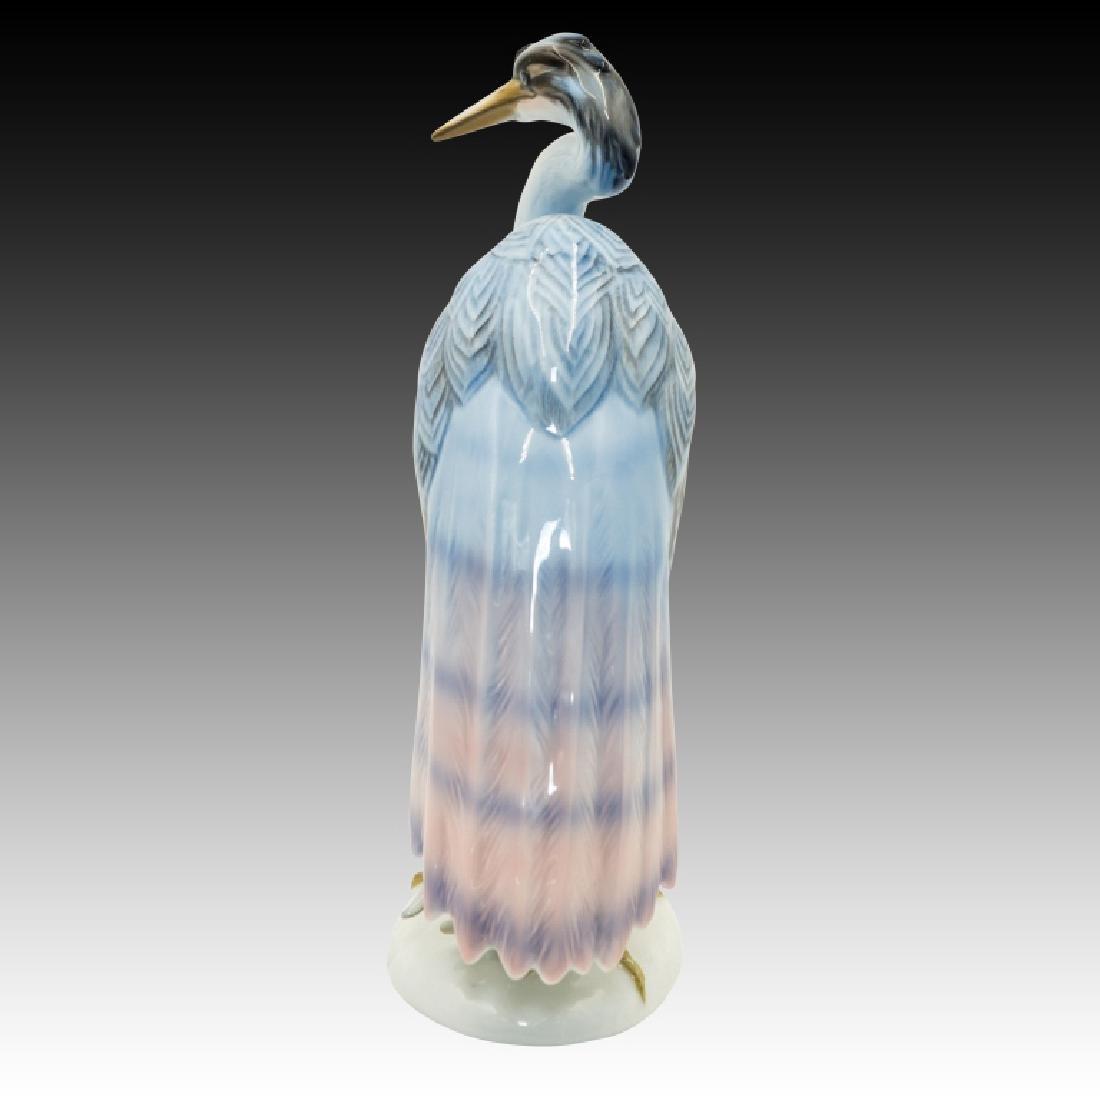 Rosenthal Large Heron Figurine - 2